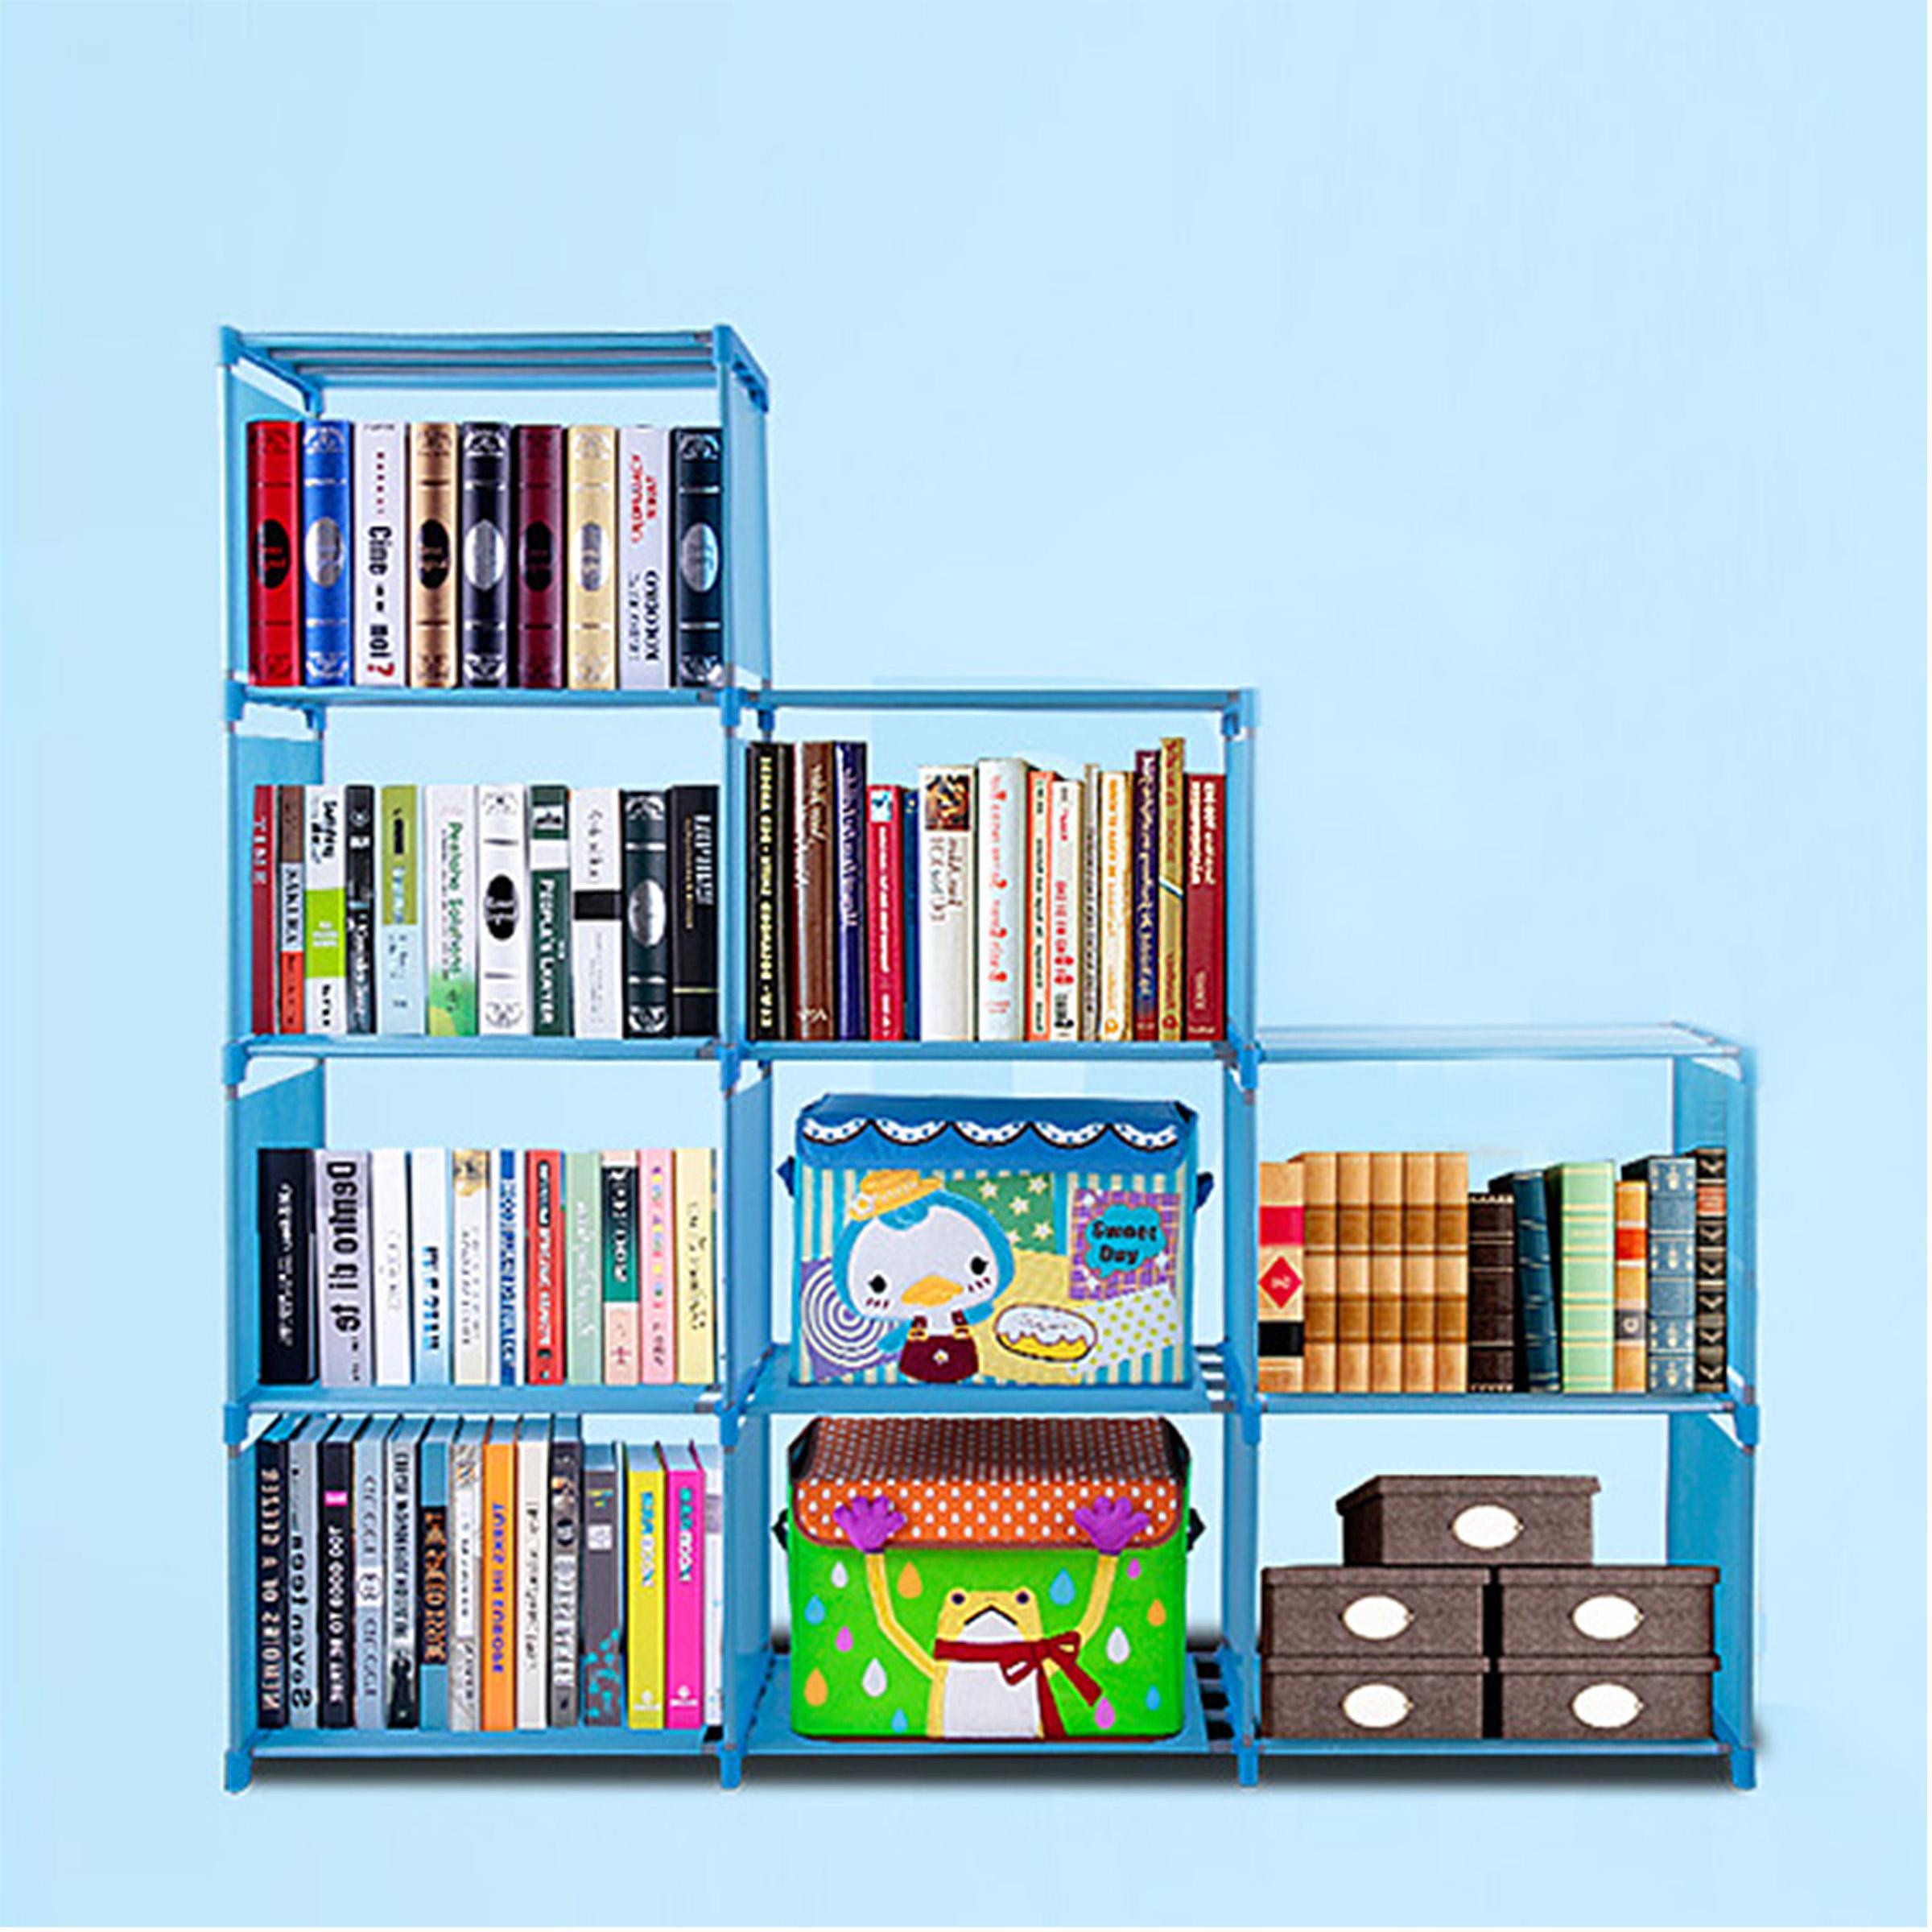 DIY Bookcase Media Storage Standing Shelf Storage Cabinet 9 Cube Toy Rack KMIMT